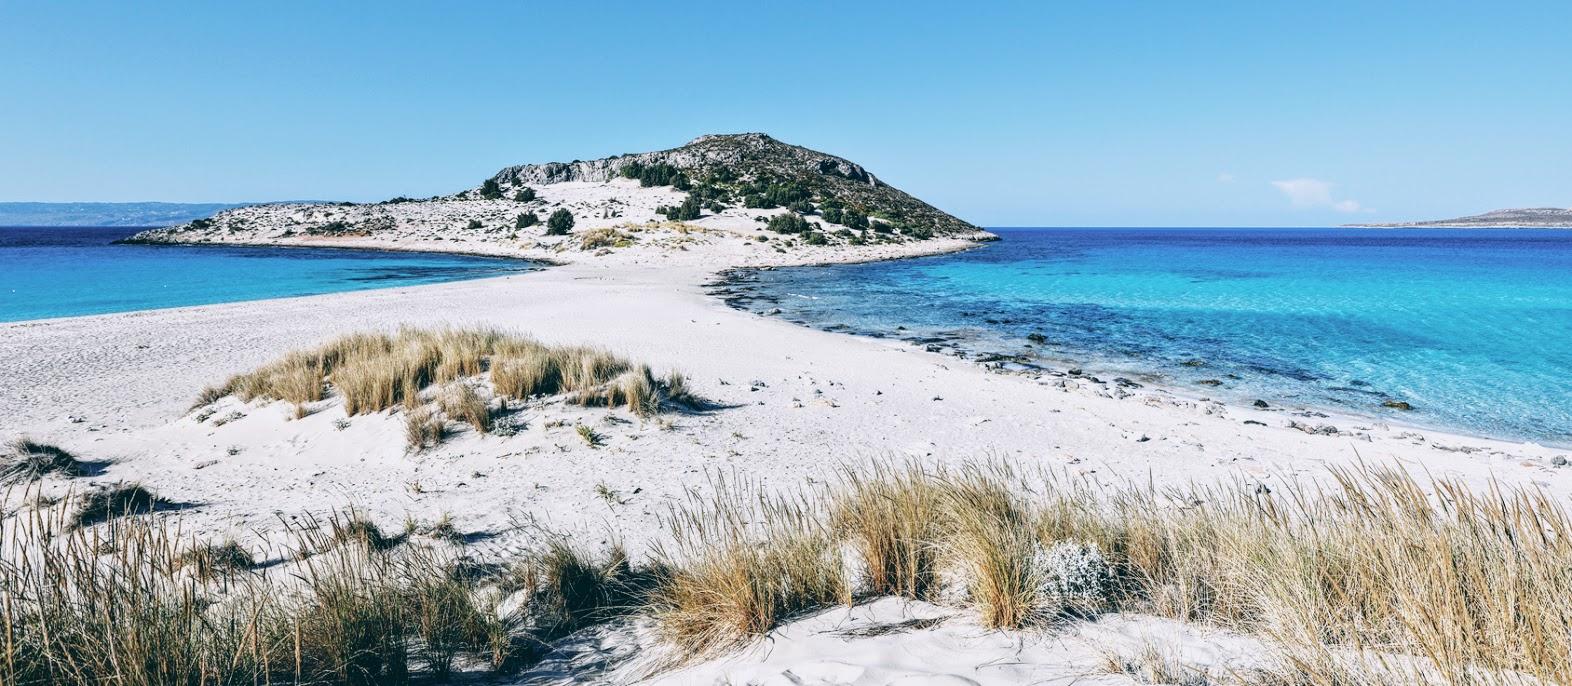 Simos beach, Elafonisos / Image: Your Greek Island